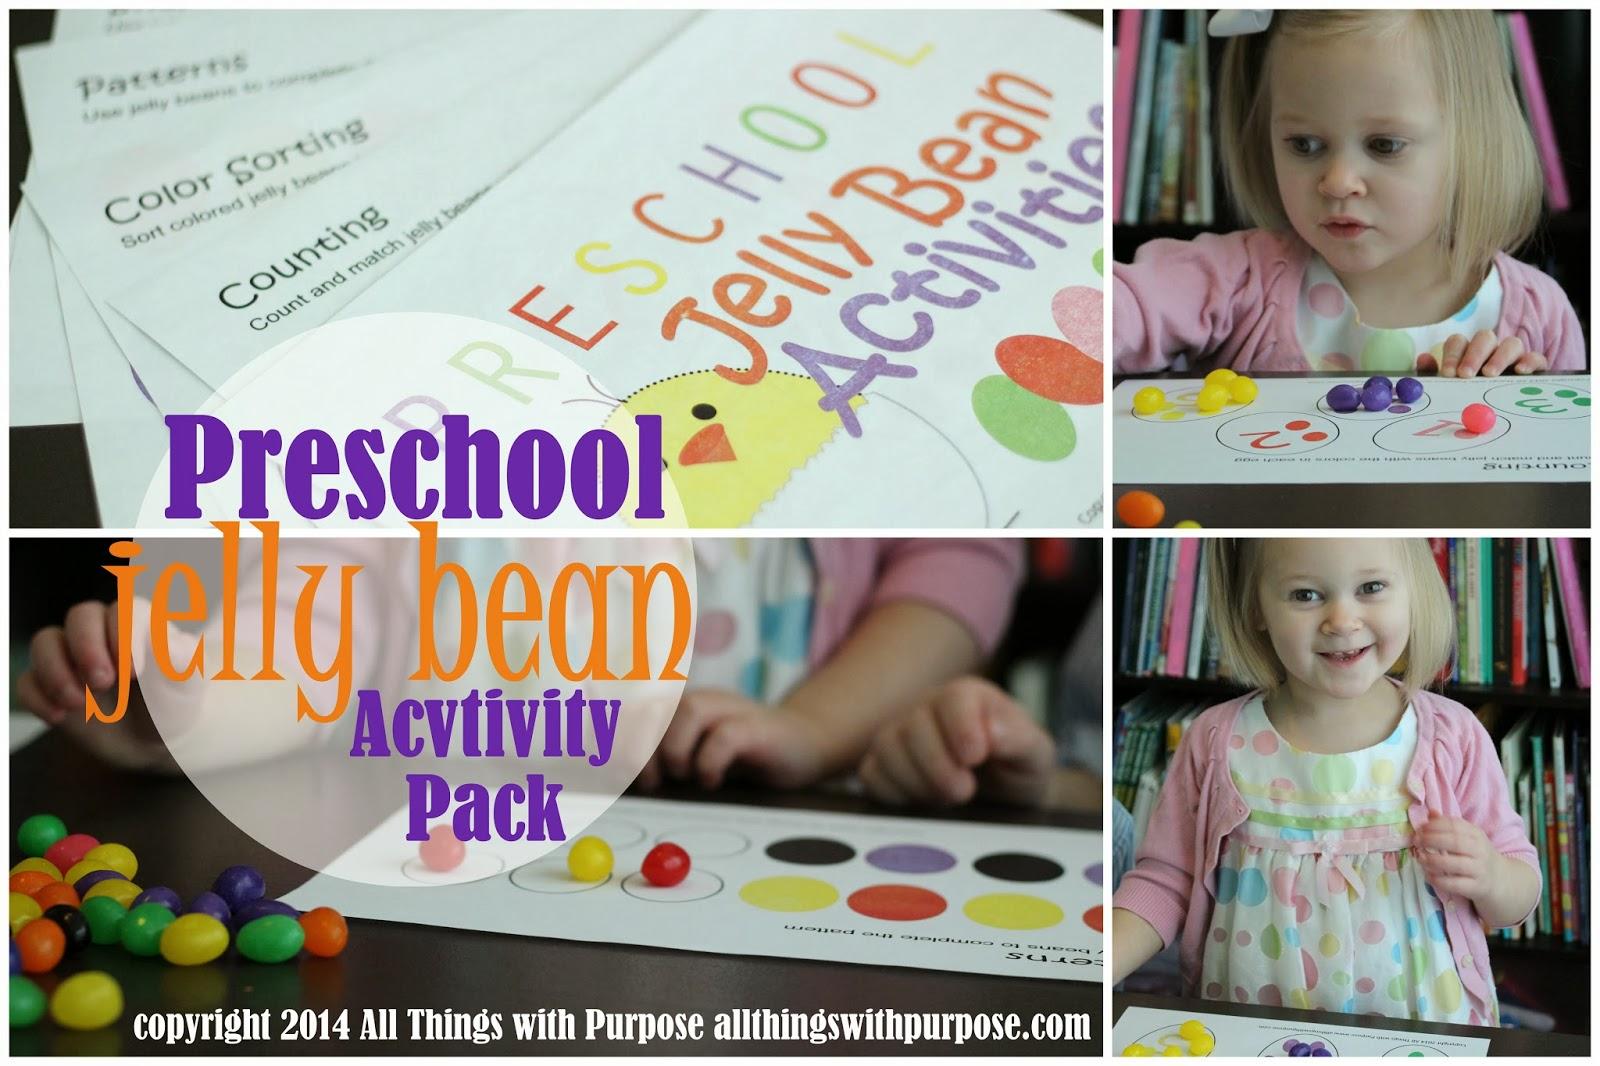 Jelly Bean Preschool Activity Pack